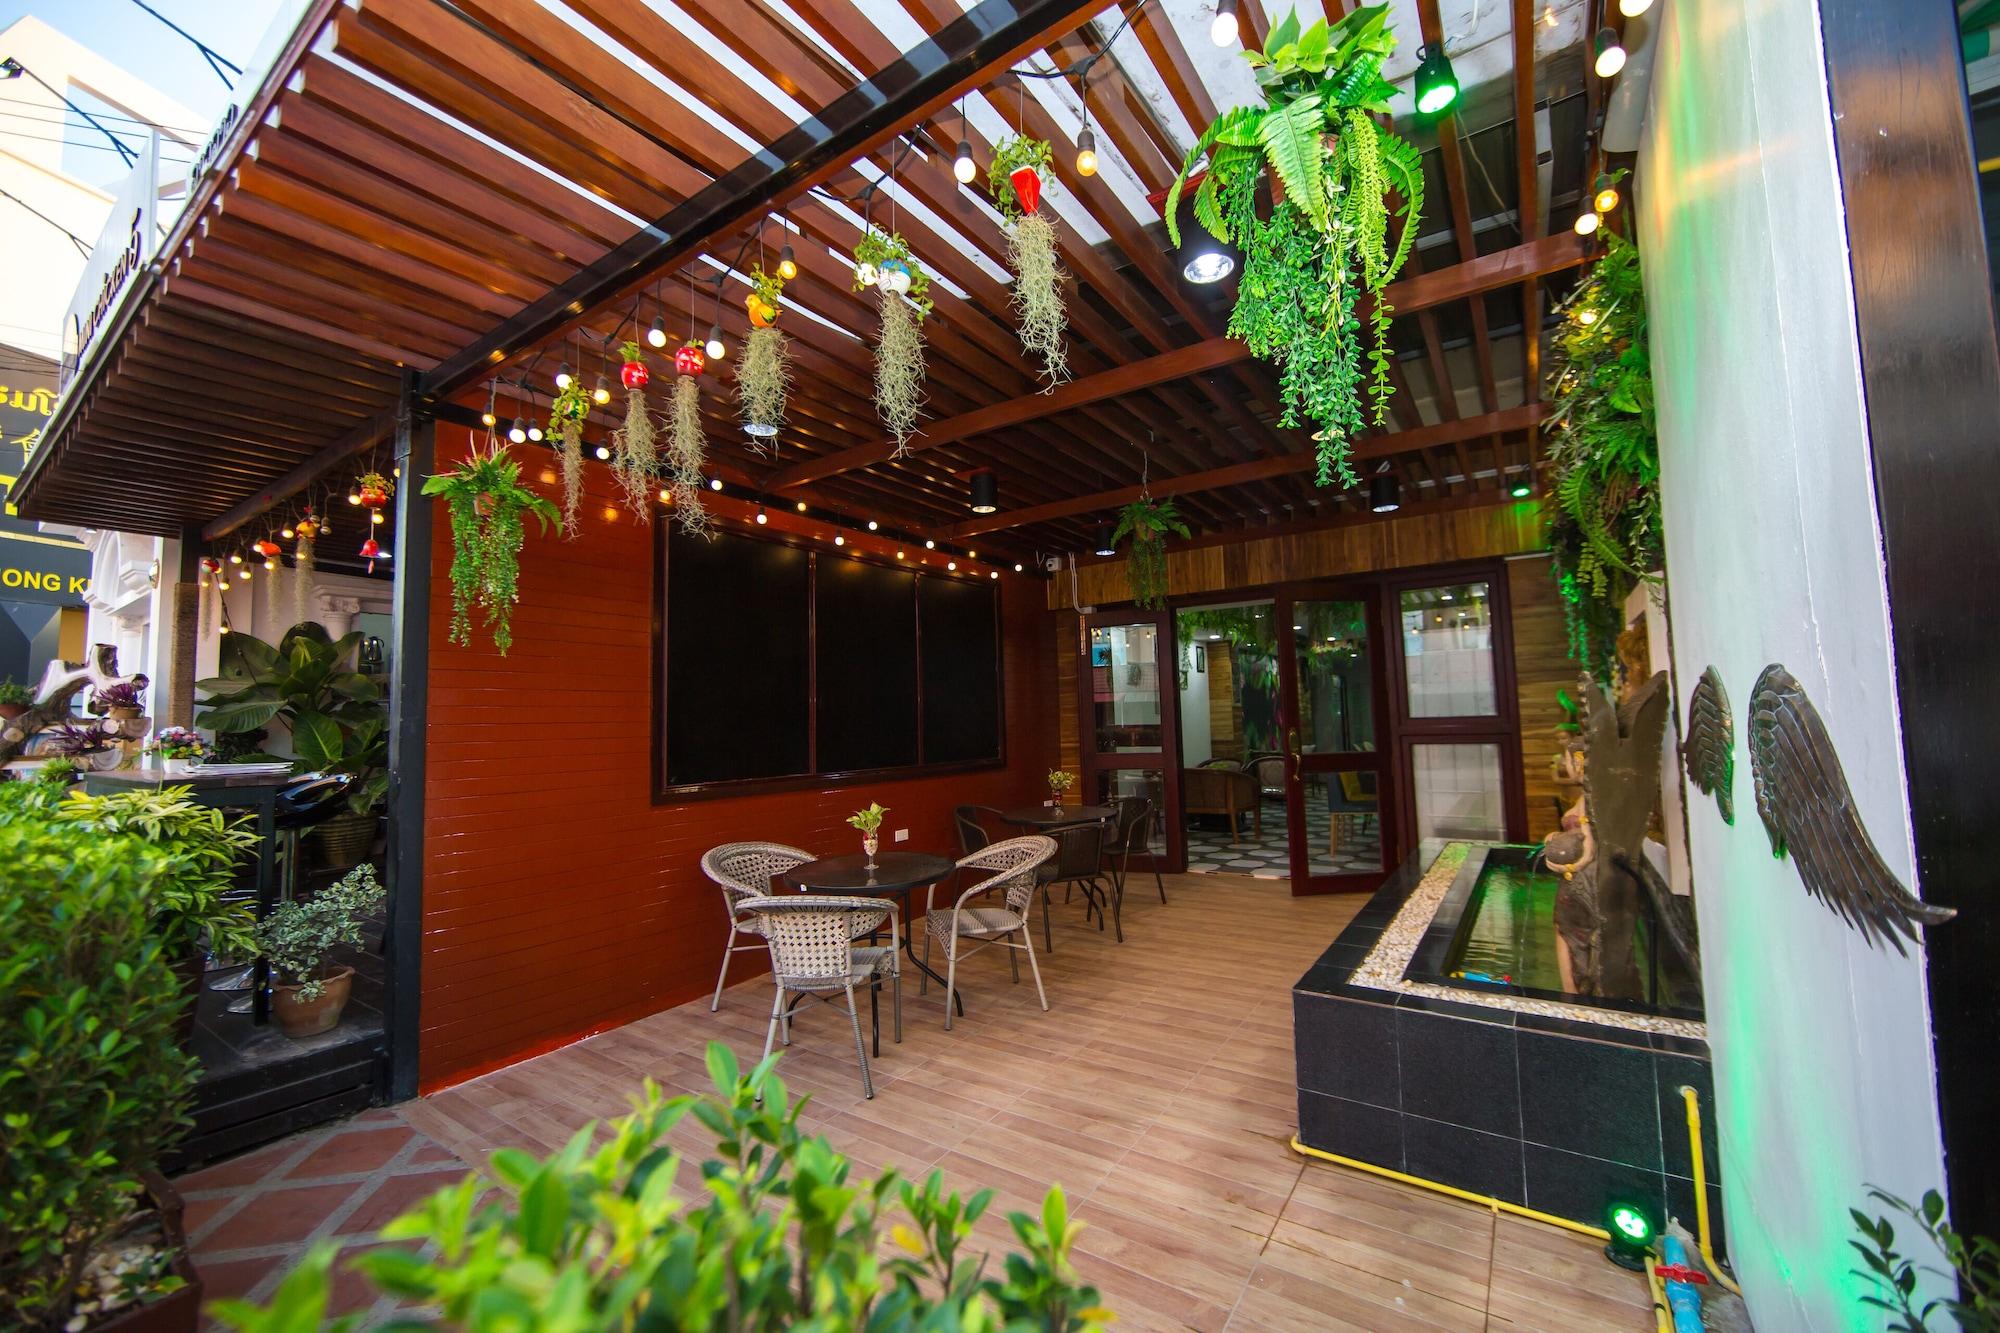 Lao Lao Cafe and Hostel, Sisattanak